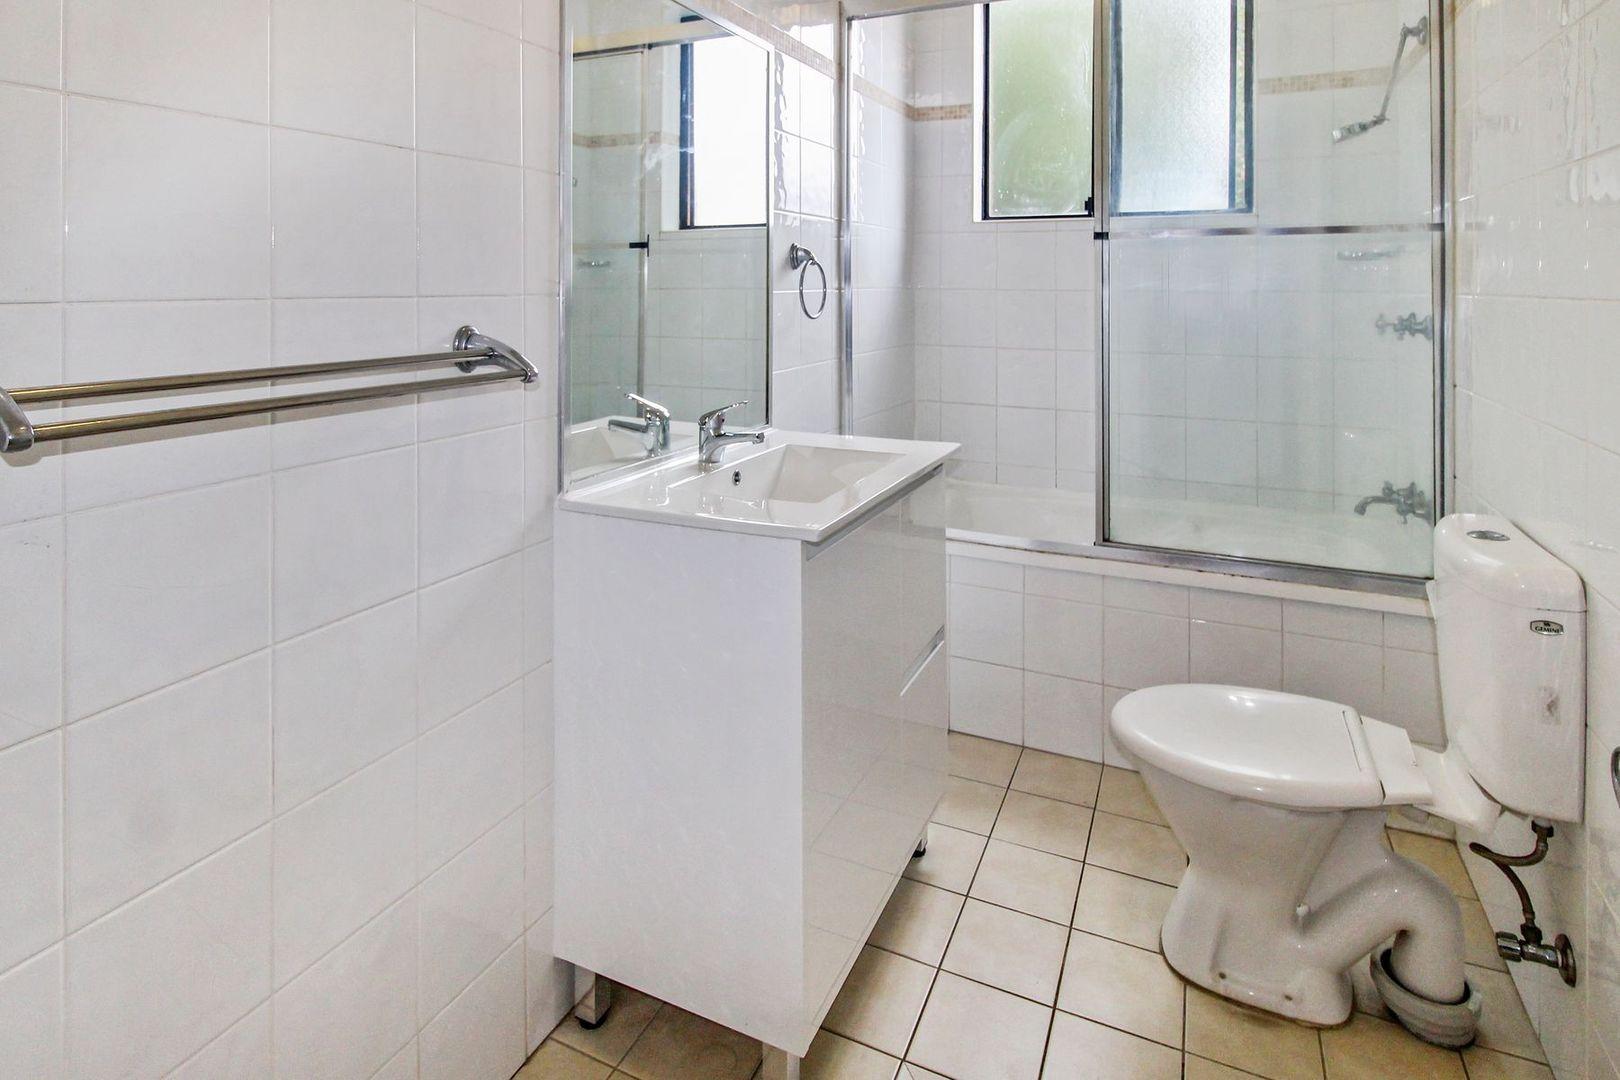 16/43 Bowden Street, Harris Park NSW 2150, Image 2